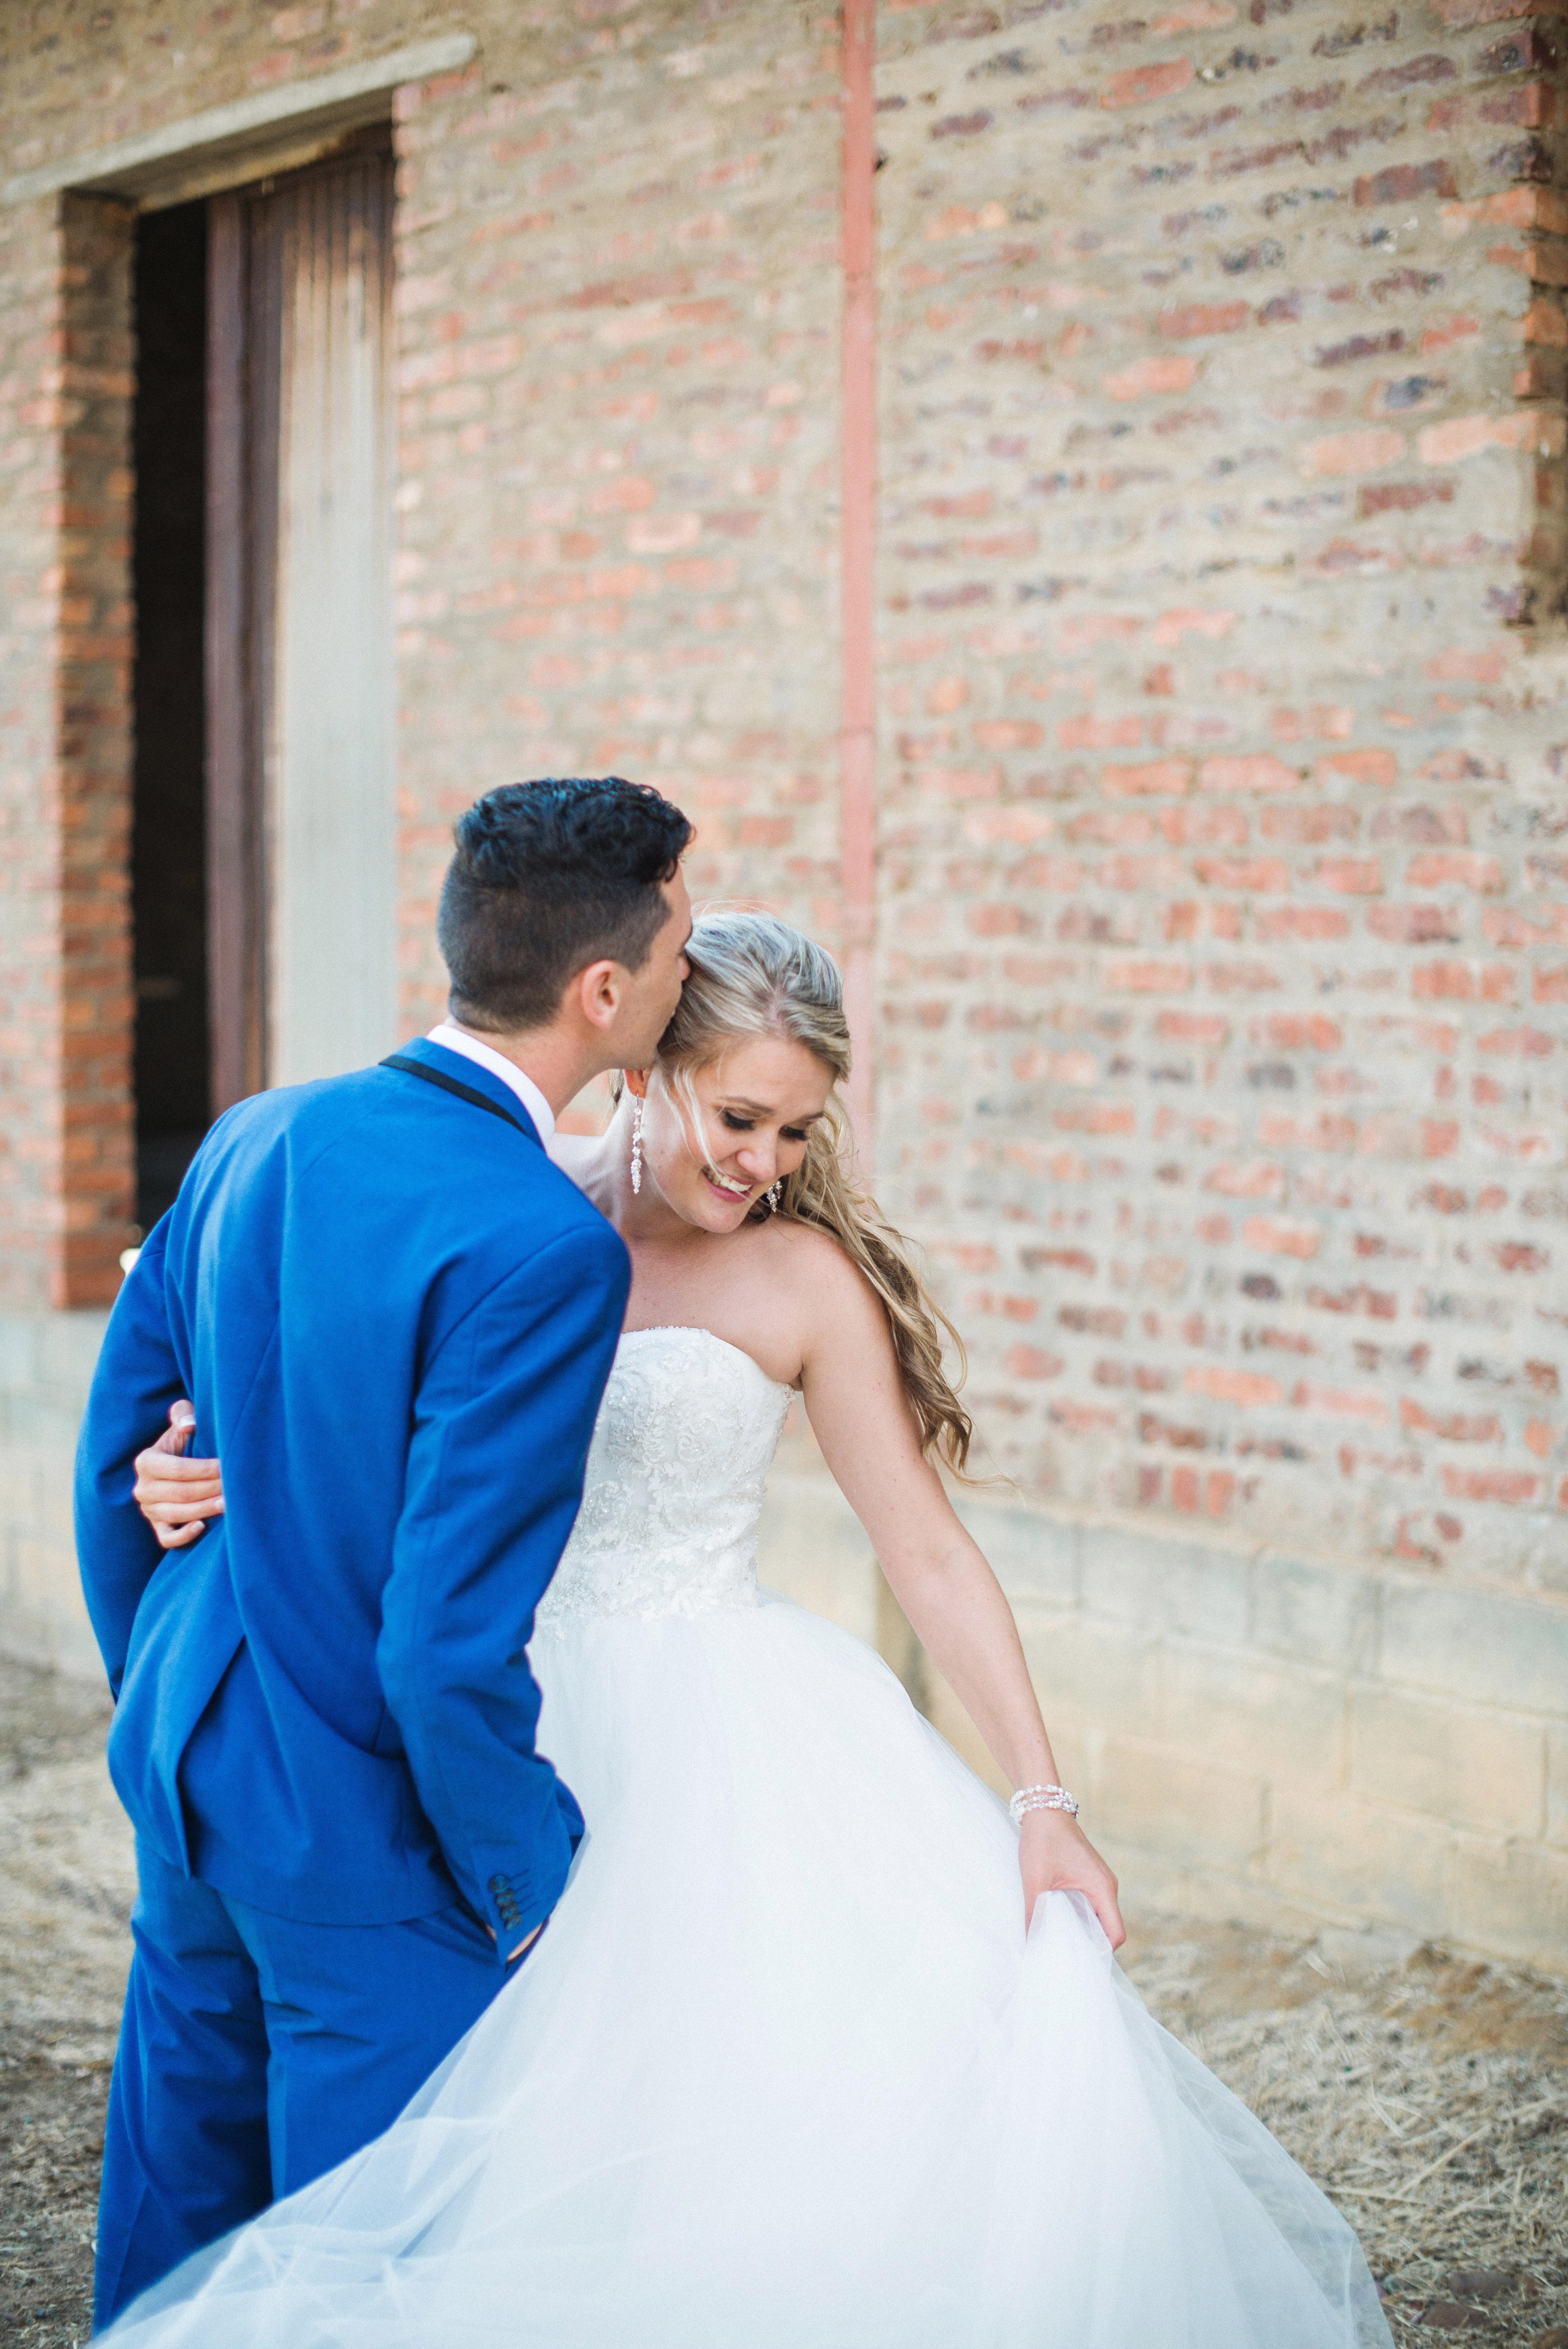 Free Images : man, woman, male, love, wedding dress, bride, groom ...